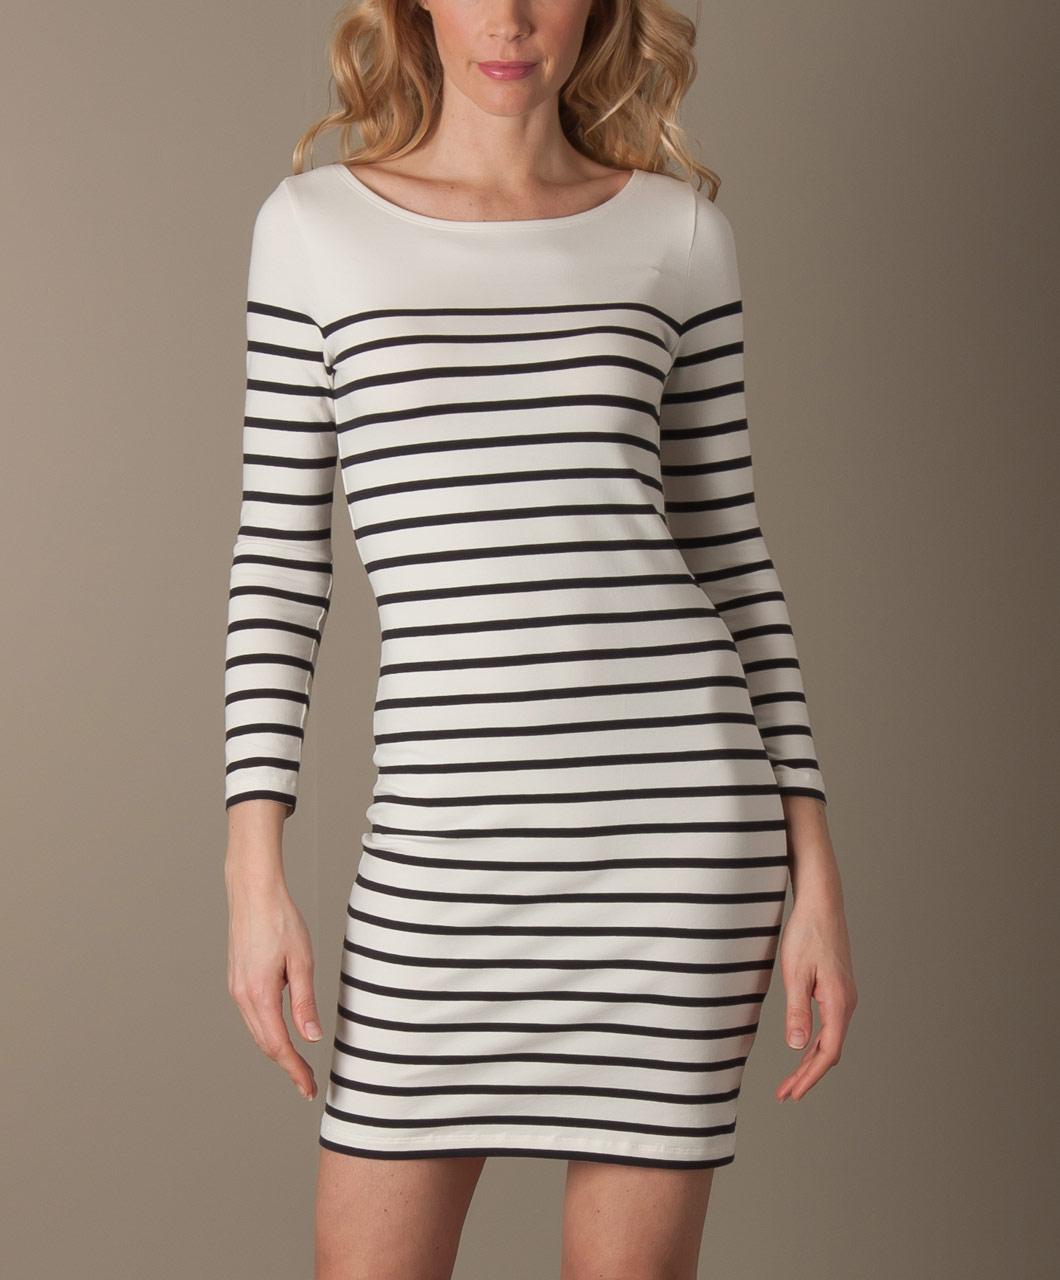 Filippa K Sailor Stripe Dress - Offwhite/Dk.Navy